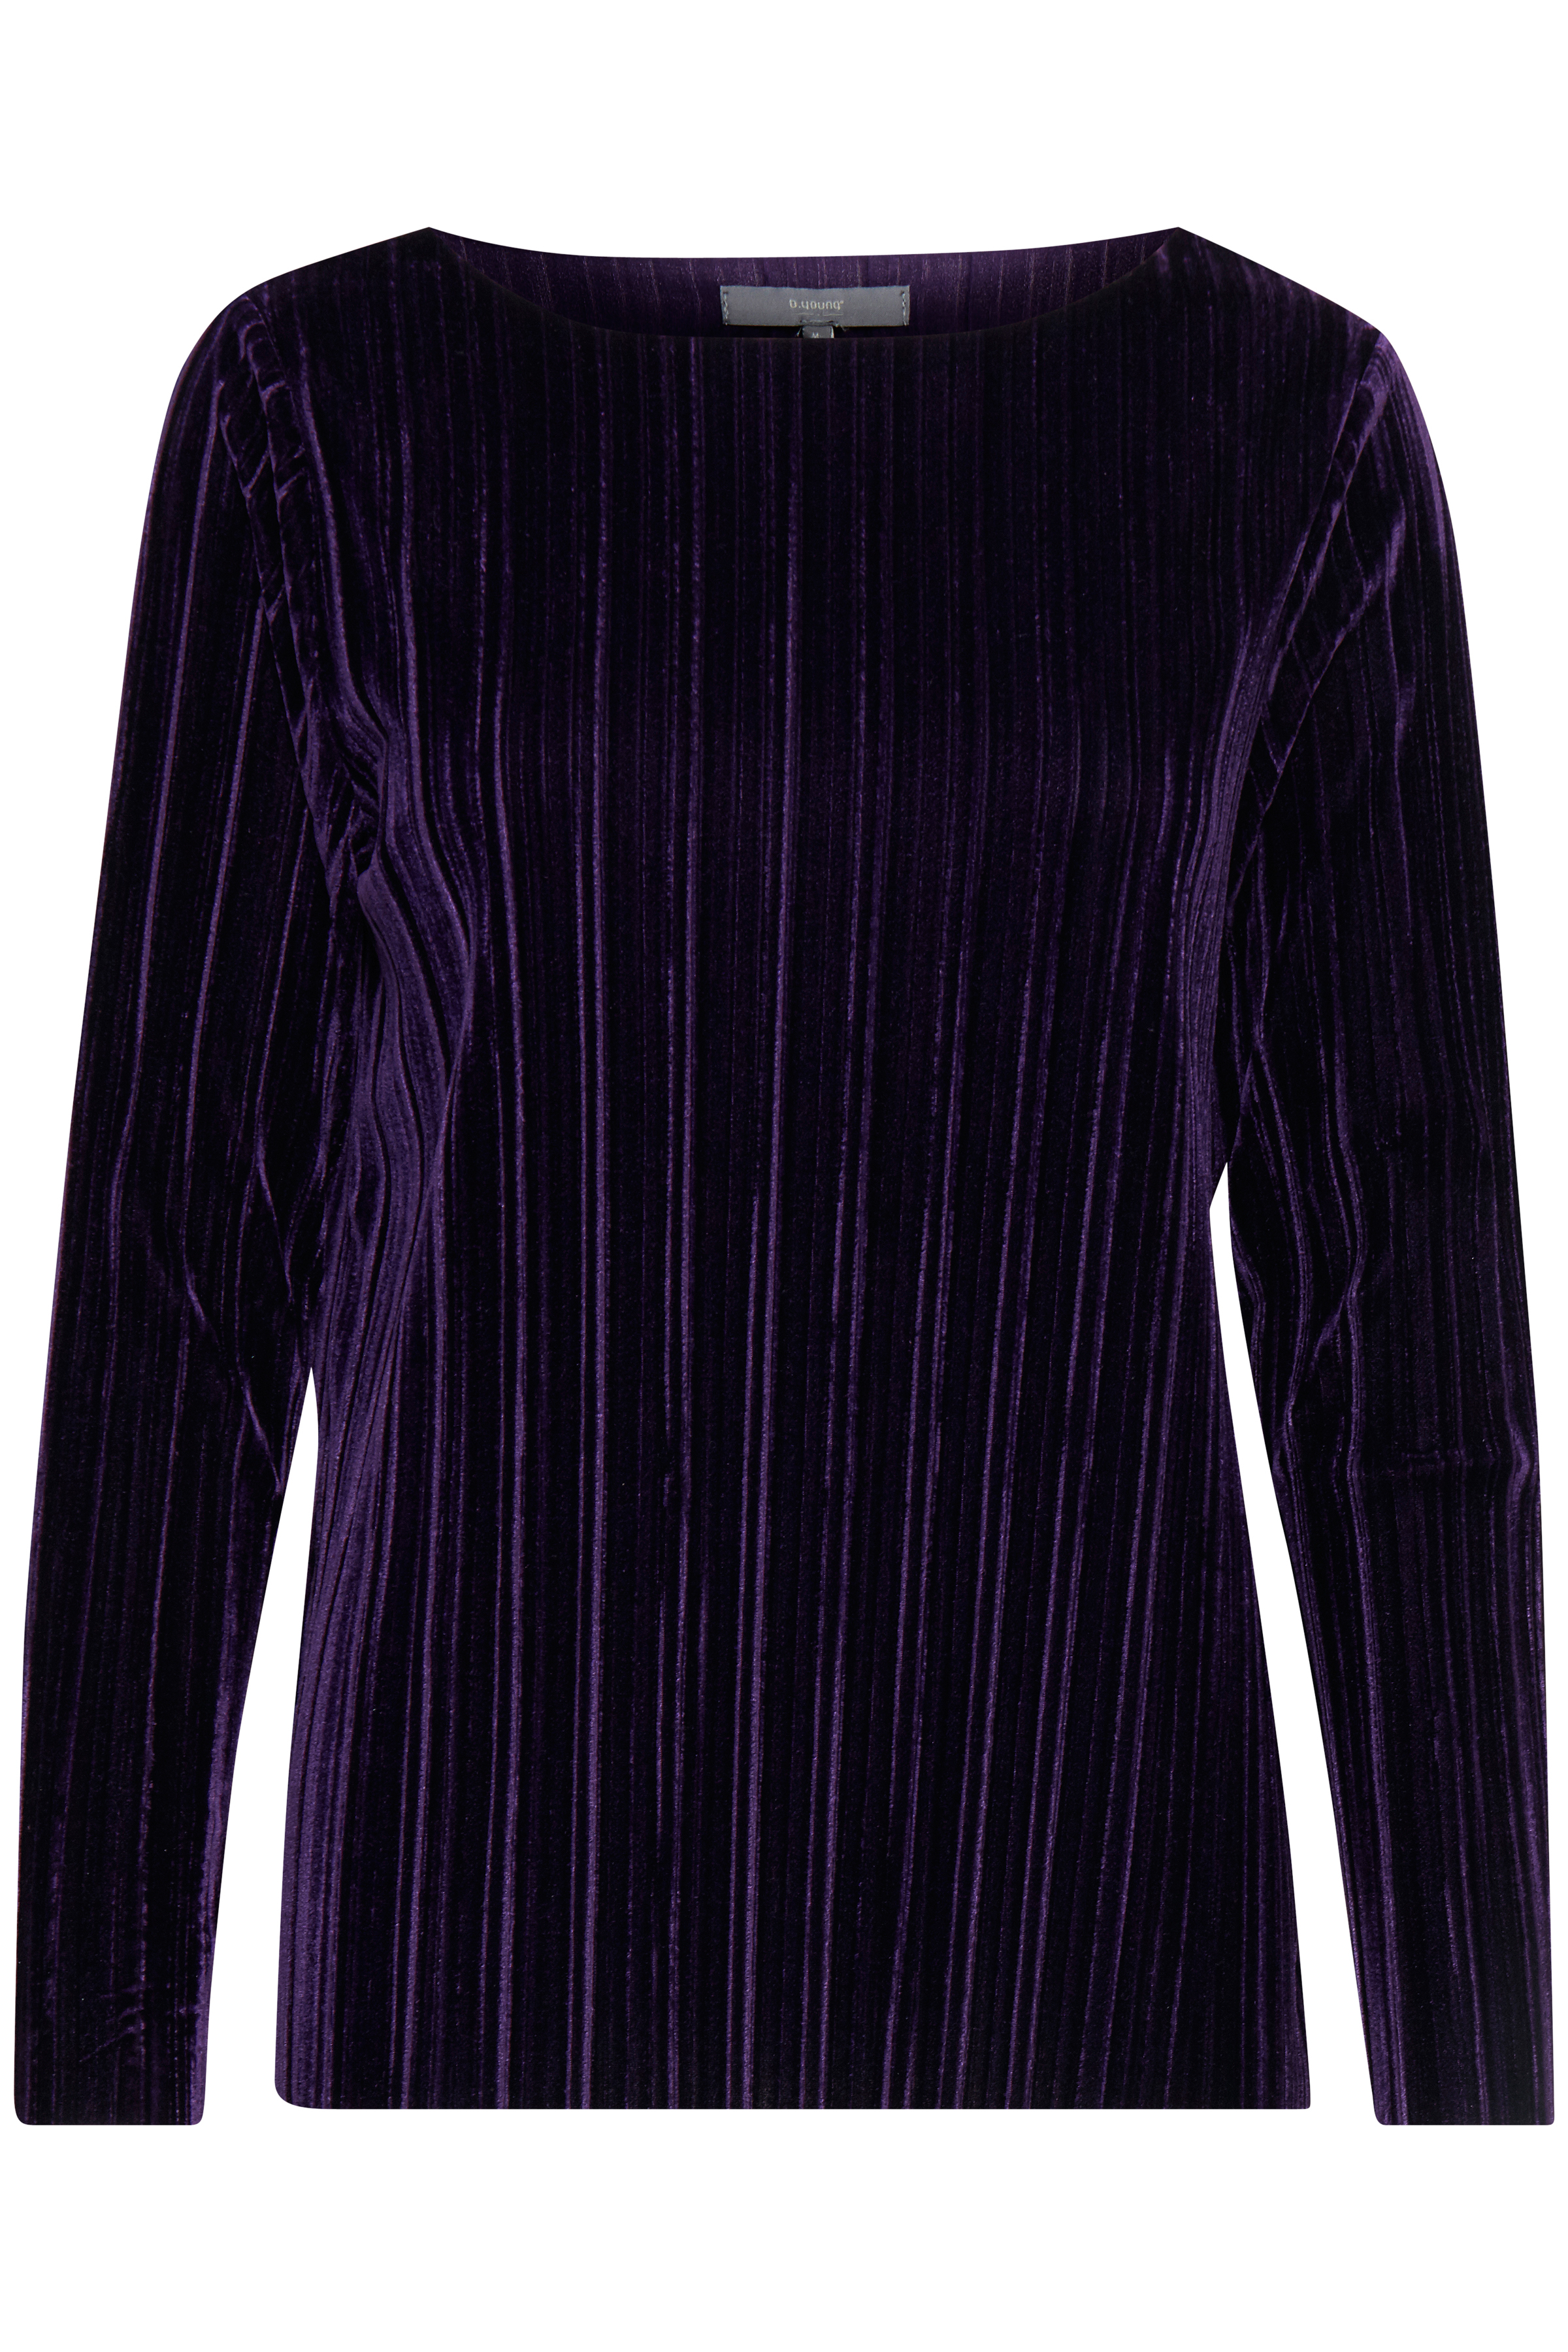 Blackberry Purple Langærmet T-shirt fra b.young – Køb Blackberry Purple Langærmet T-shirt fra str. S-XXL her